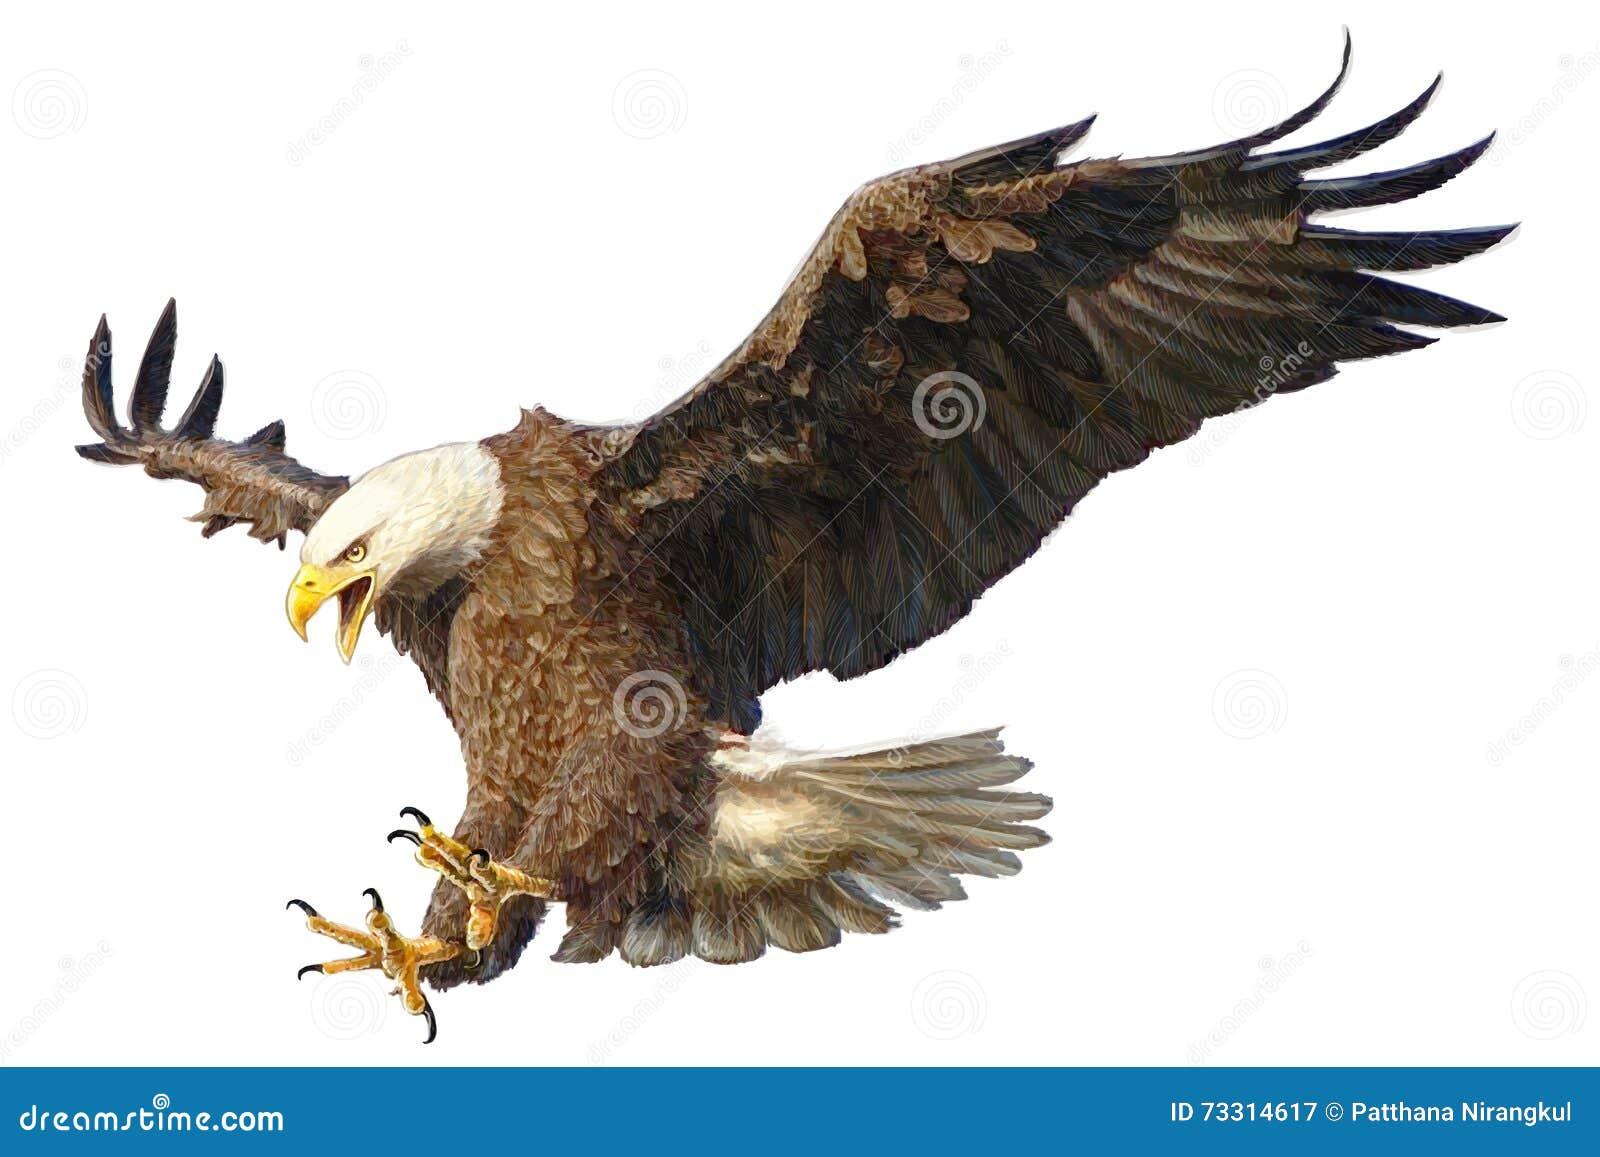 How To Draw Bald Eagle Head Dark Brown Hairs